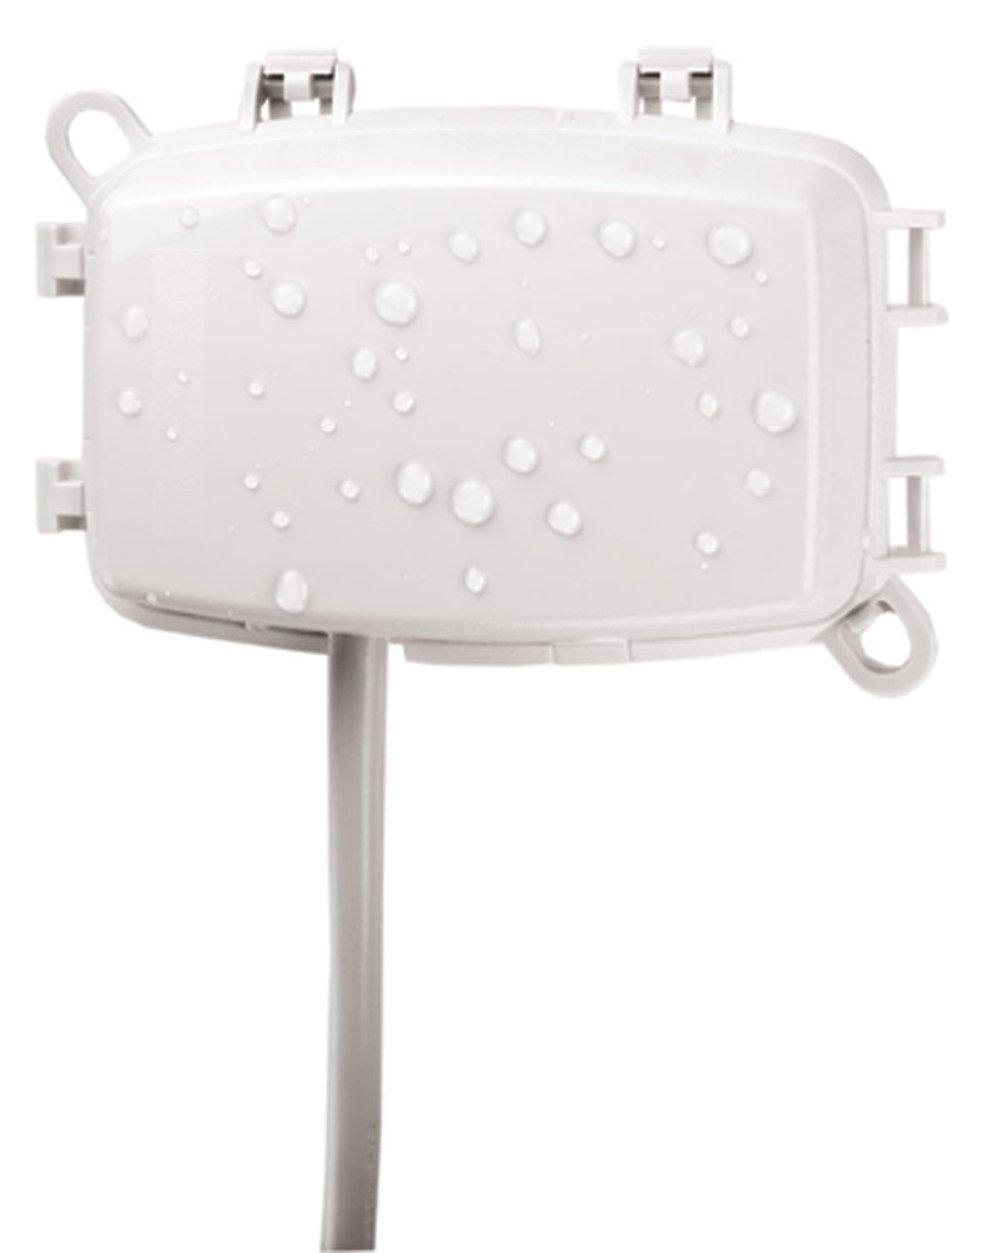 Intermatic WP1100WC 1 Gang Vertical Horizontal 2 3 4 Inch Weatherproof Box White